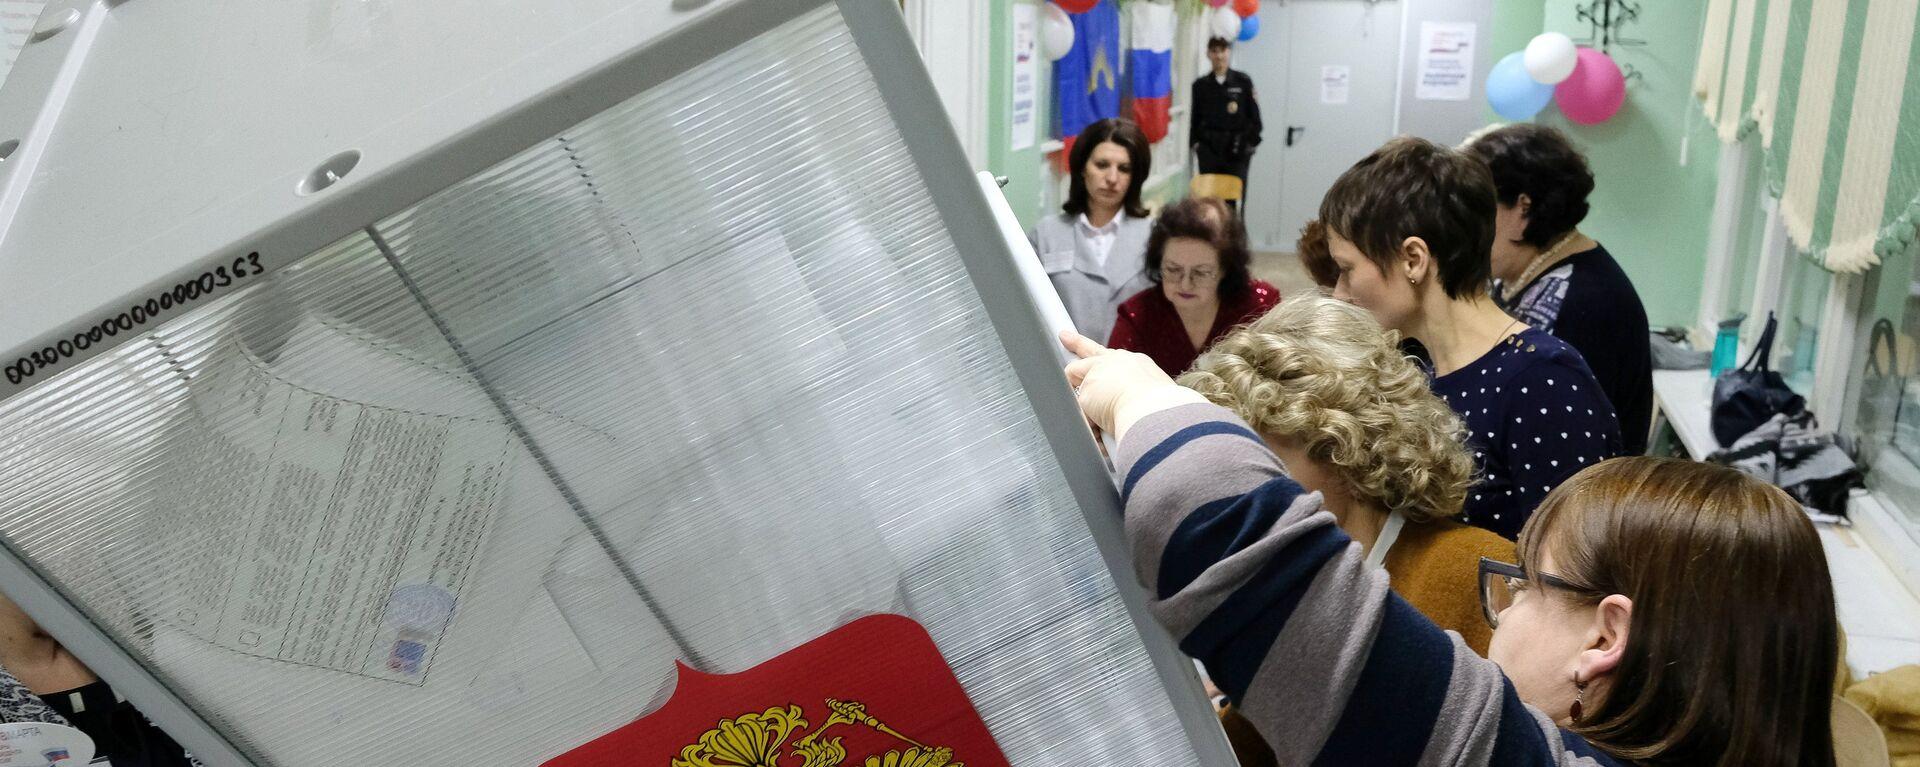 Подсчет голосов на выборах президента РФ - Sputnik Тоҷикистон, 1920, 11.01.2021